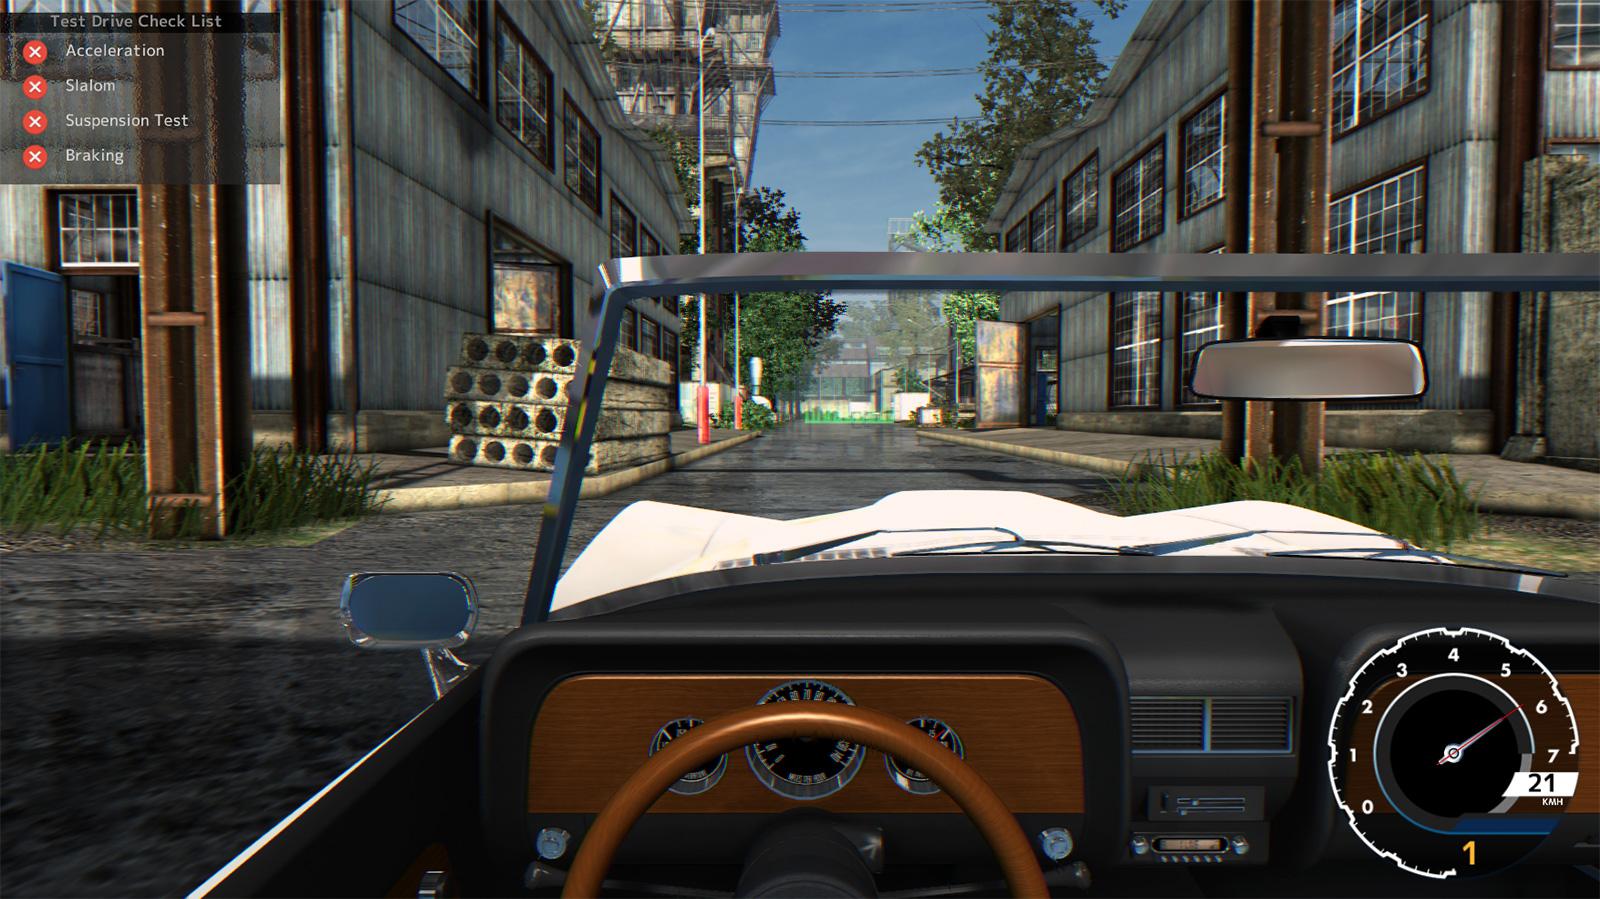 dating simulator games pc windows 10 2015